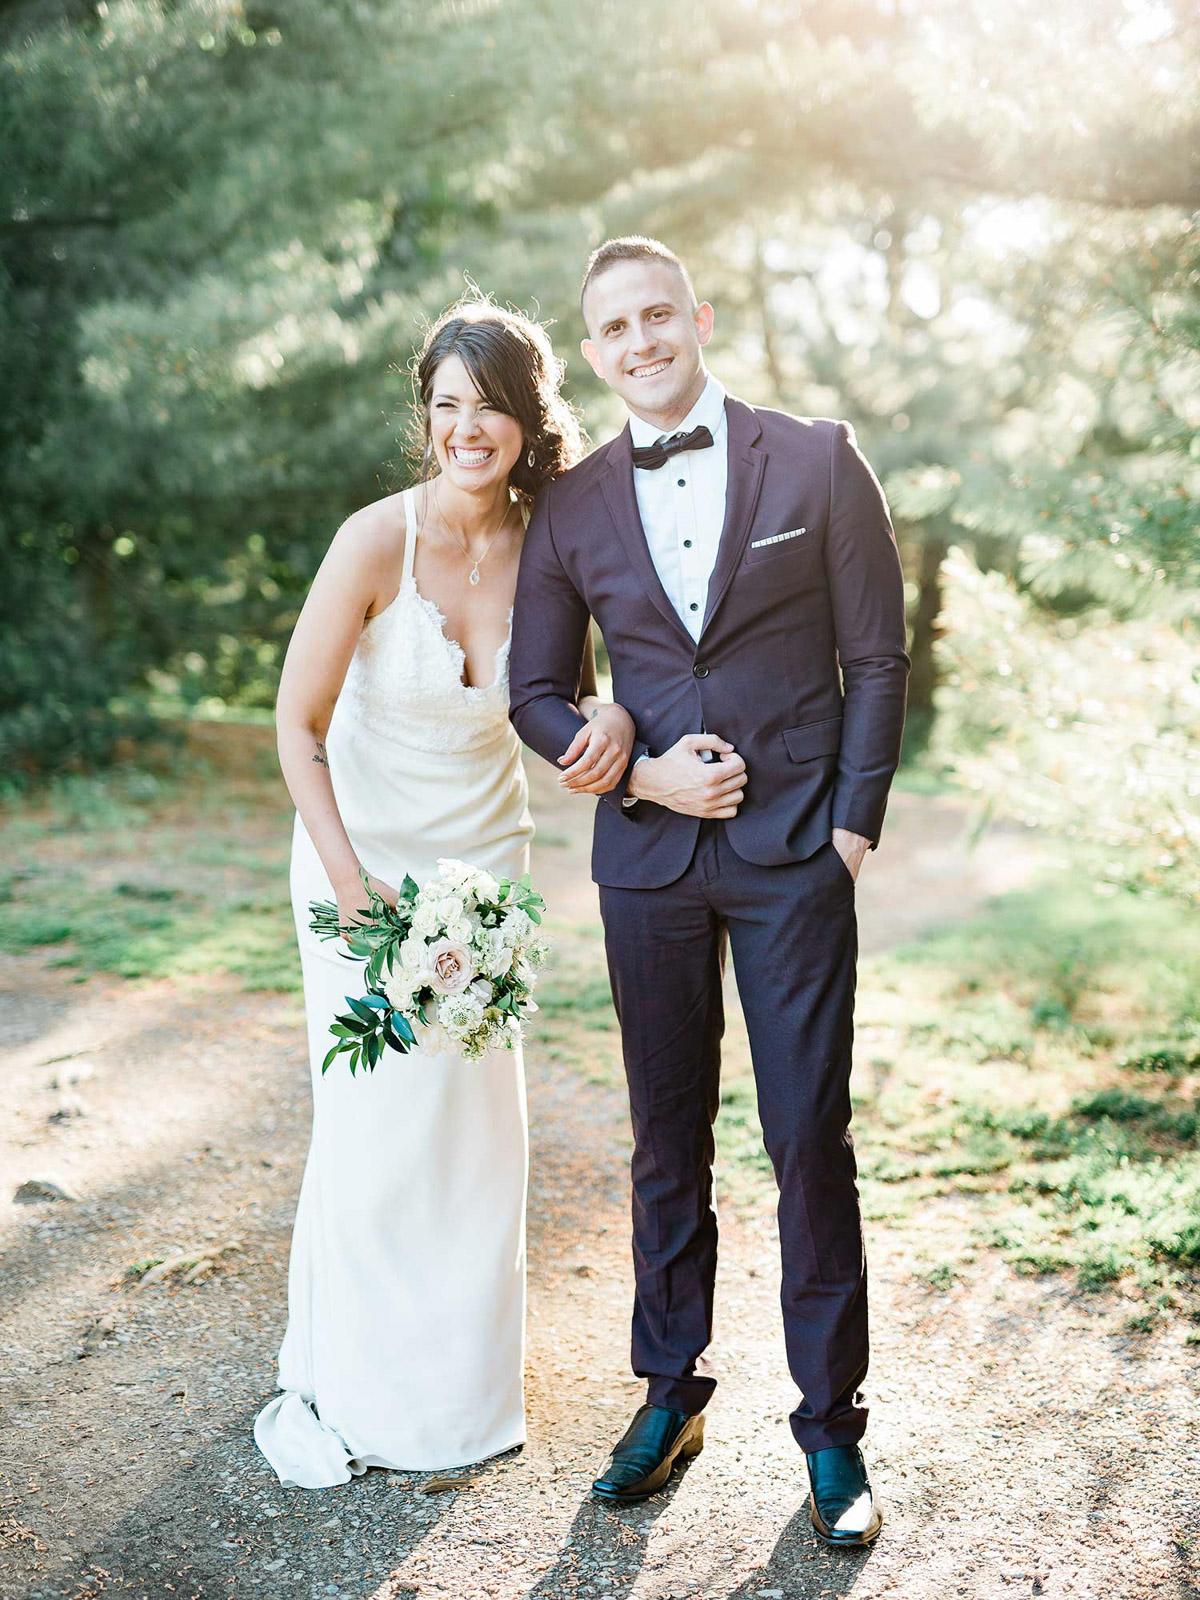 destiny-dawn-photography-vineyard-bride-swish-list-knollwood-golf-and-country-club-ancaster-wedding-editorial-26.jpg